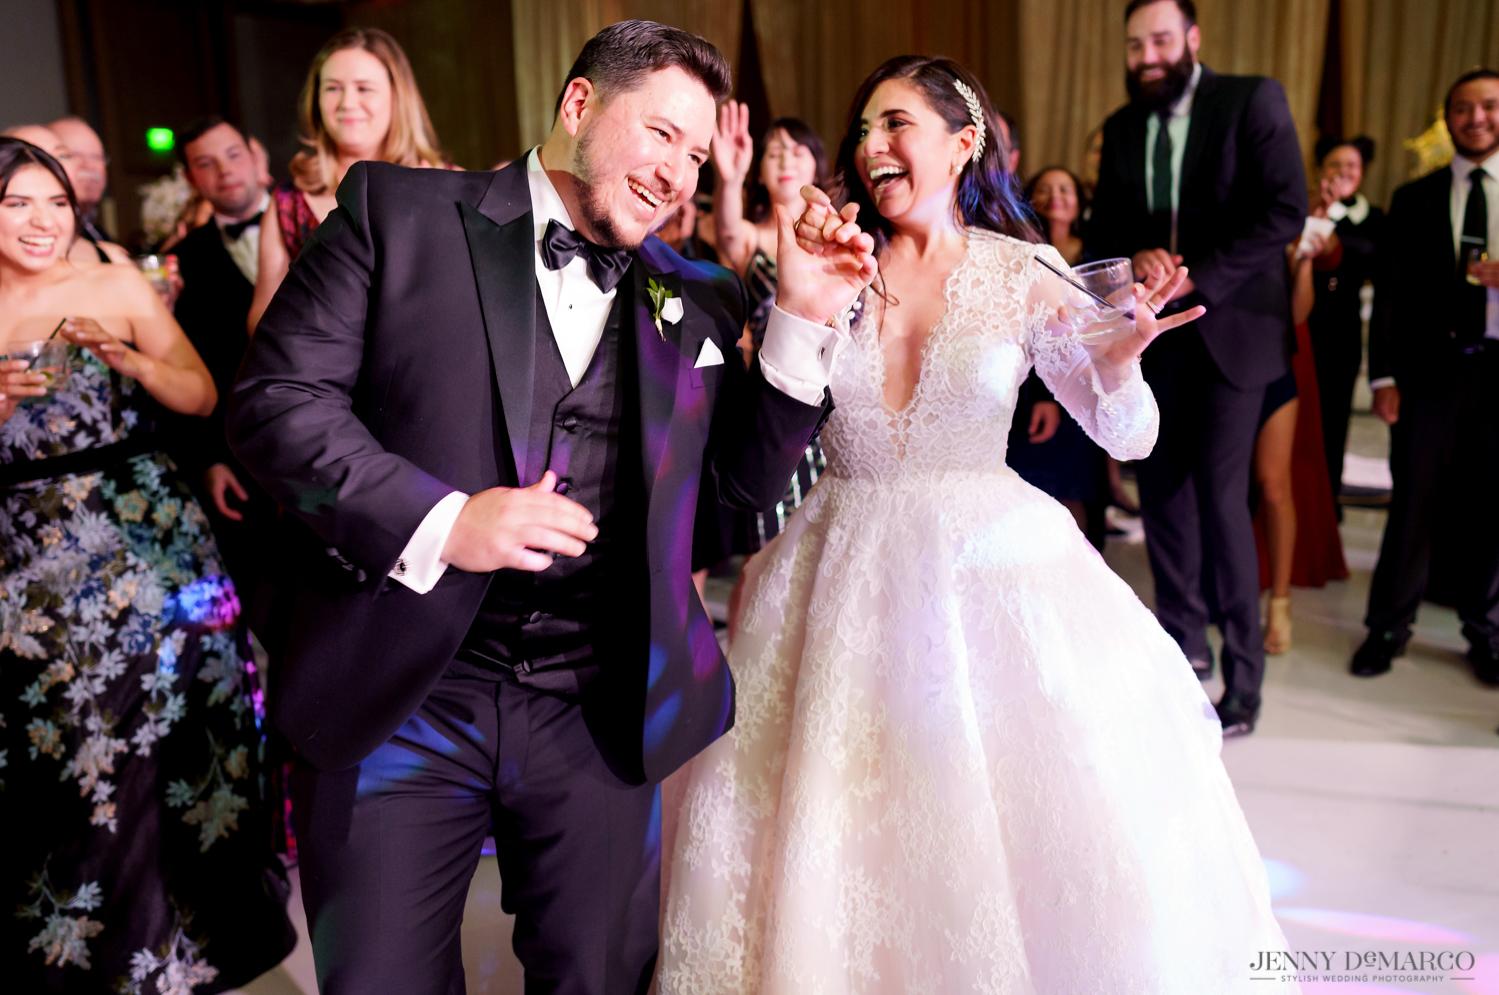 bride and groom dancing a the wedding reception